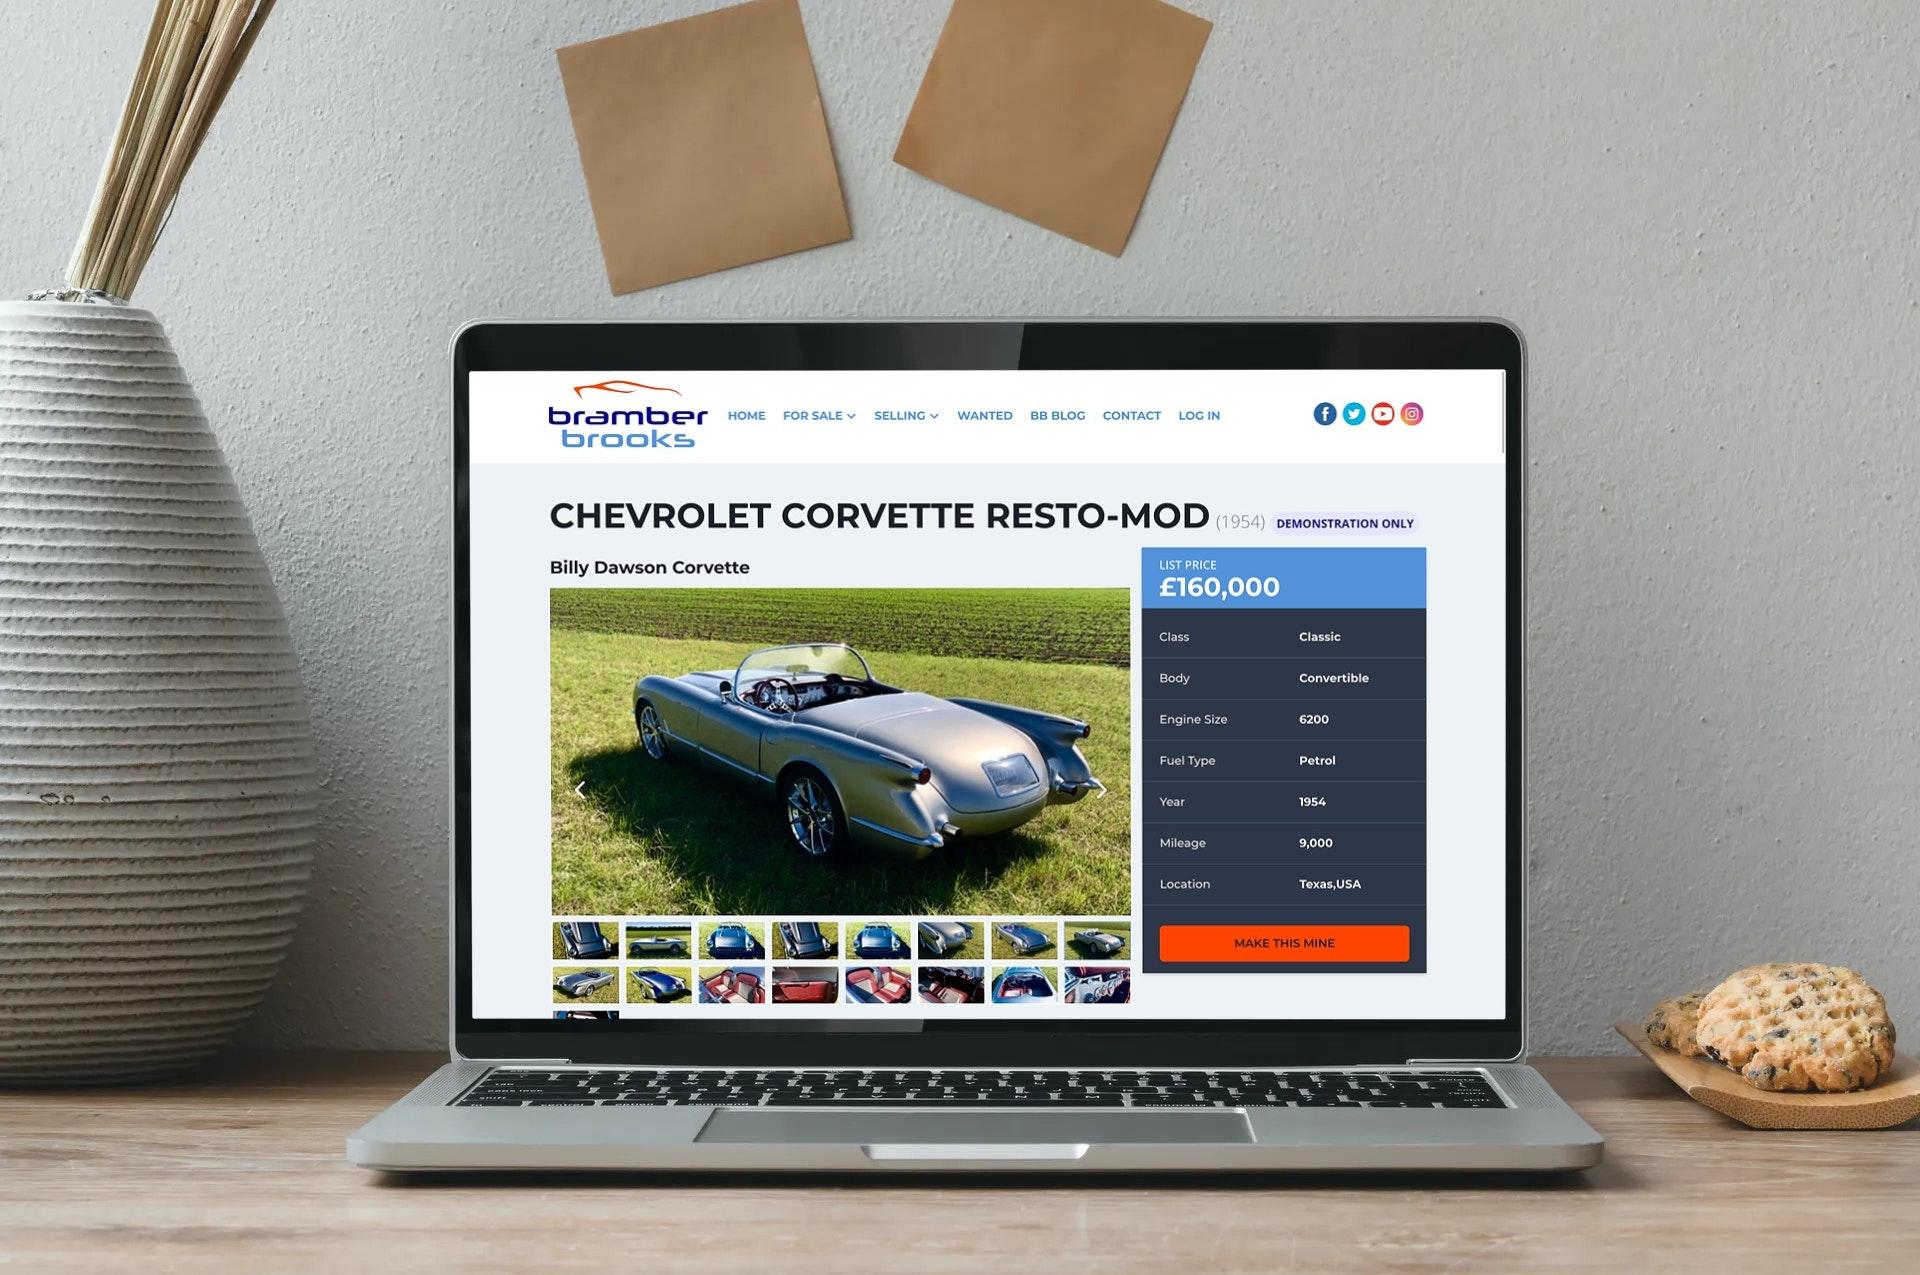 Car page on Bramber Brooks website displayed on laptop